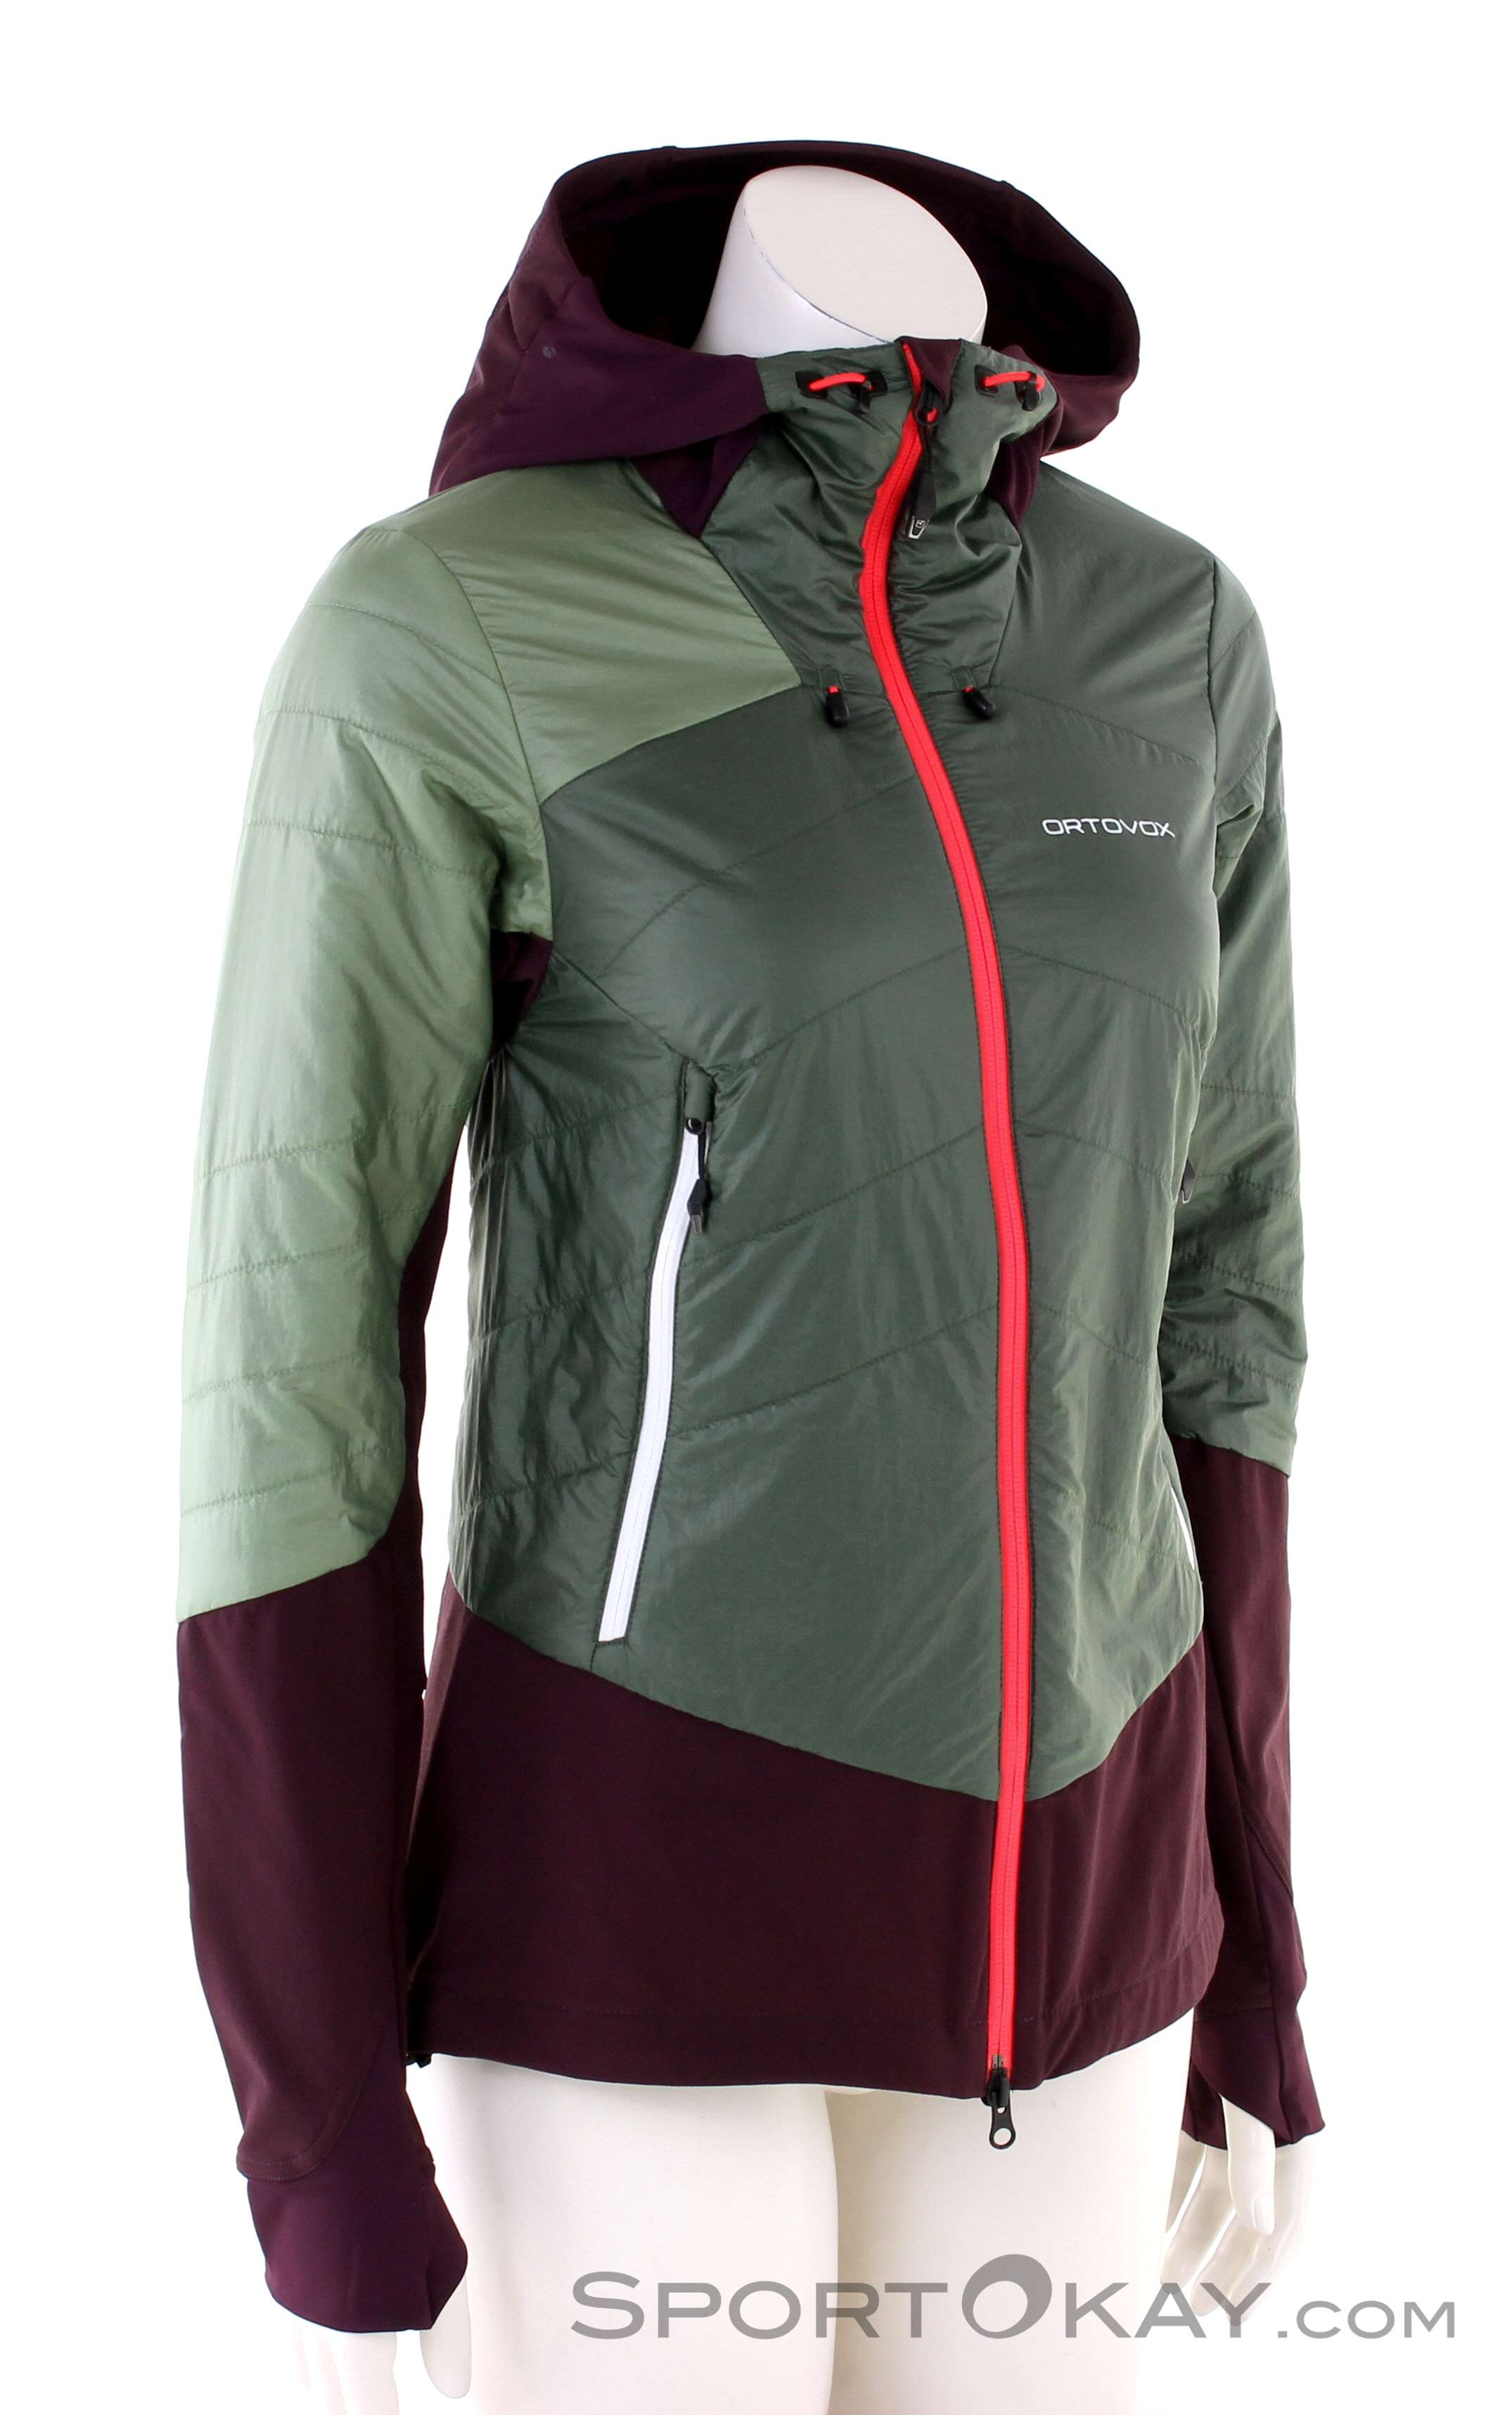 Ortovox Swisswool Piz Bial Womens Ski Touring Jacket